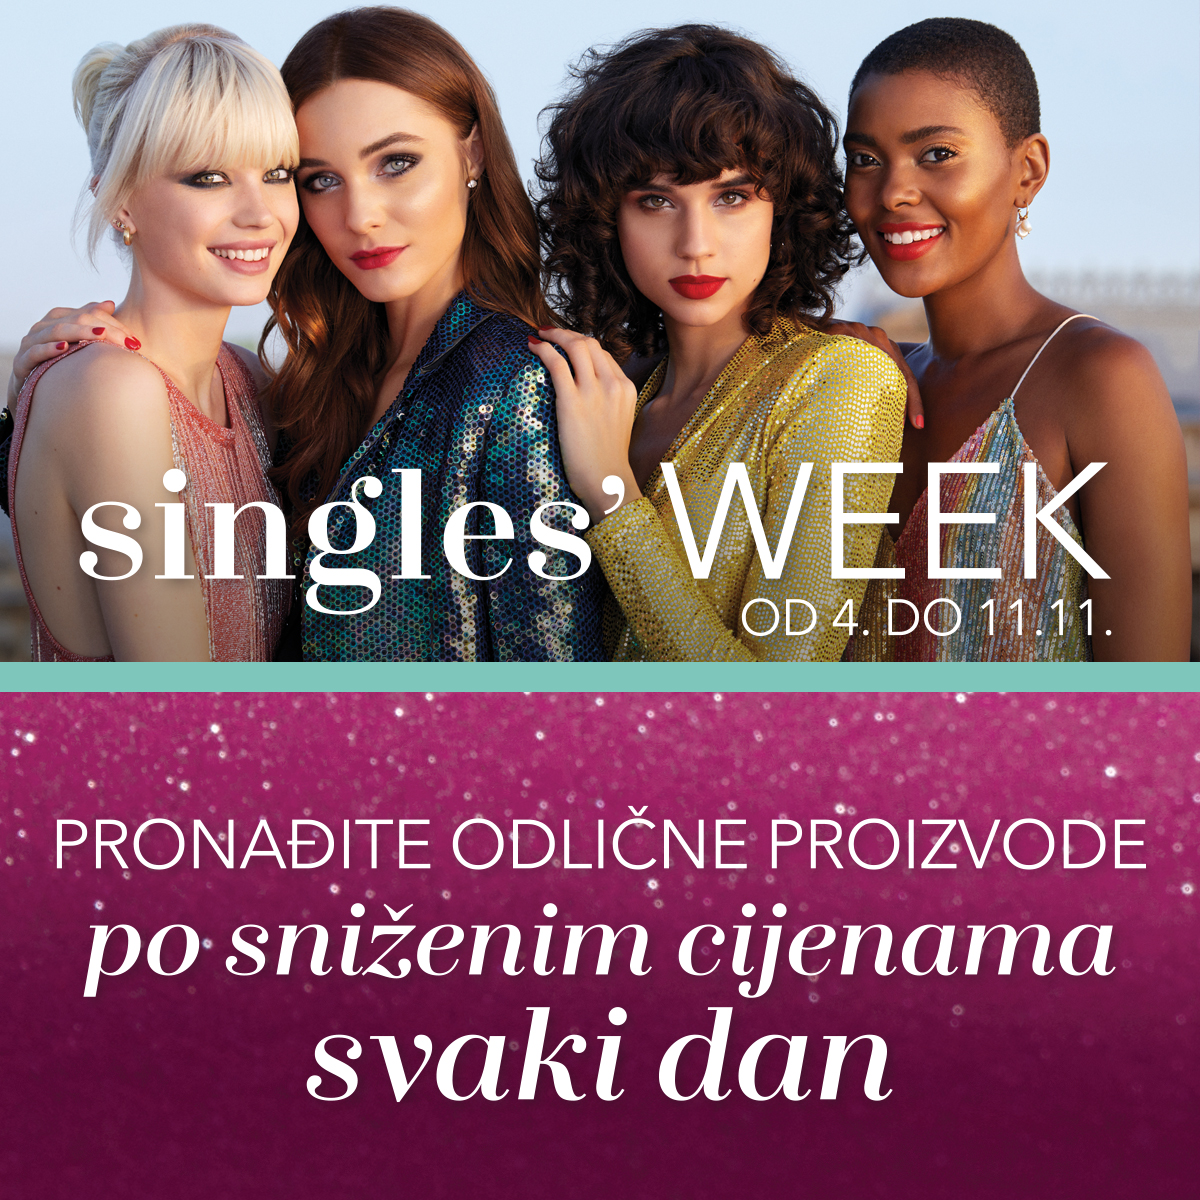 SinglesWeek_1200x1200_2